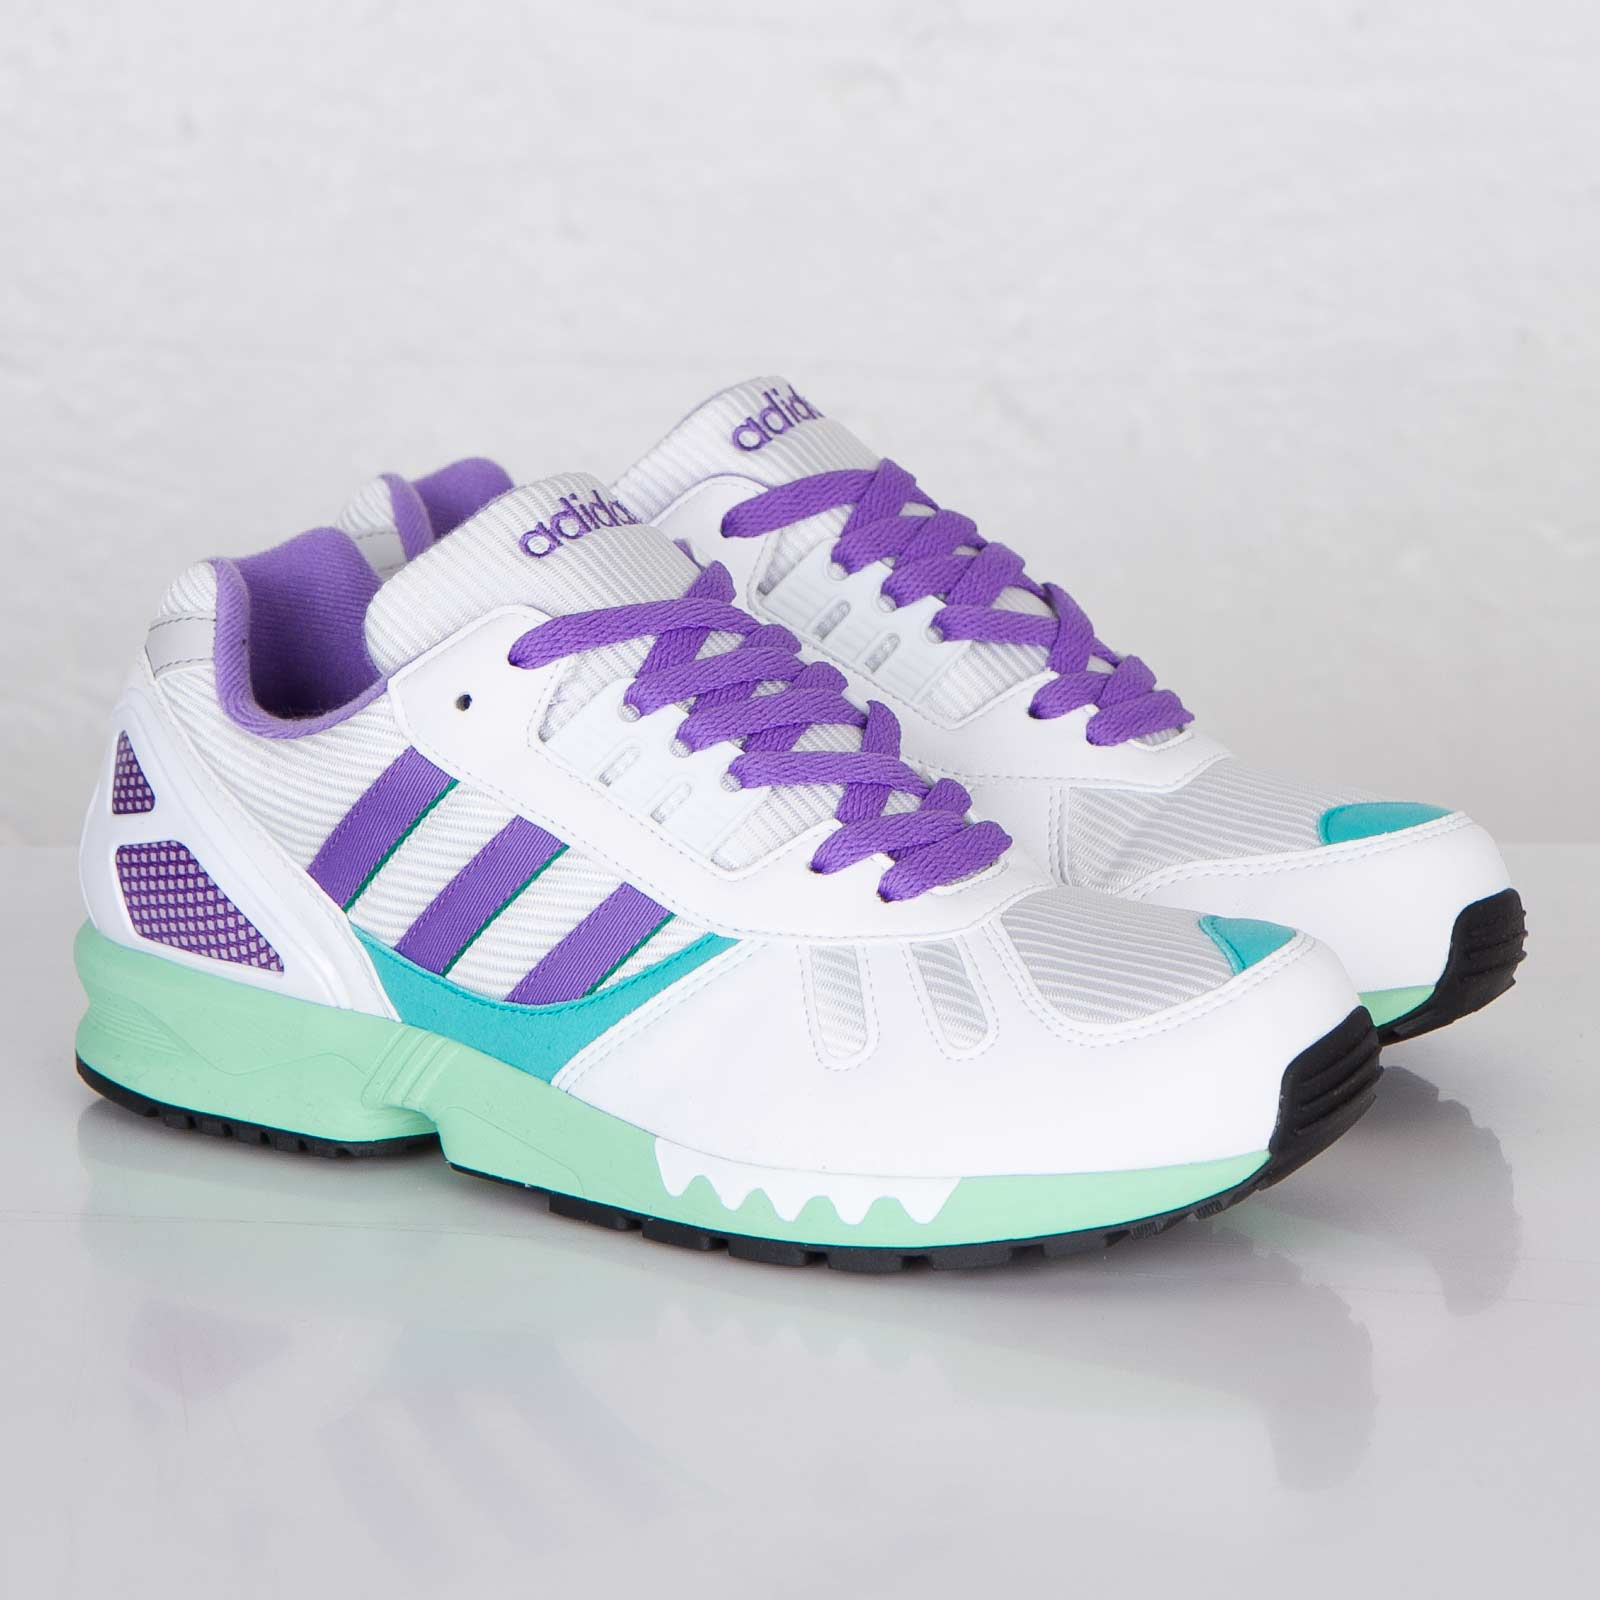 usine authentique 5b011 512da adidas ZX 7000 - M17295 - Sneakersnstuff | sneakers ...